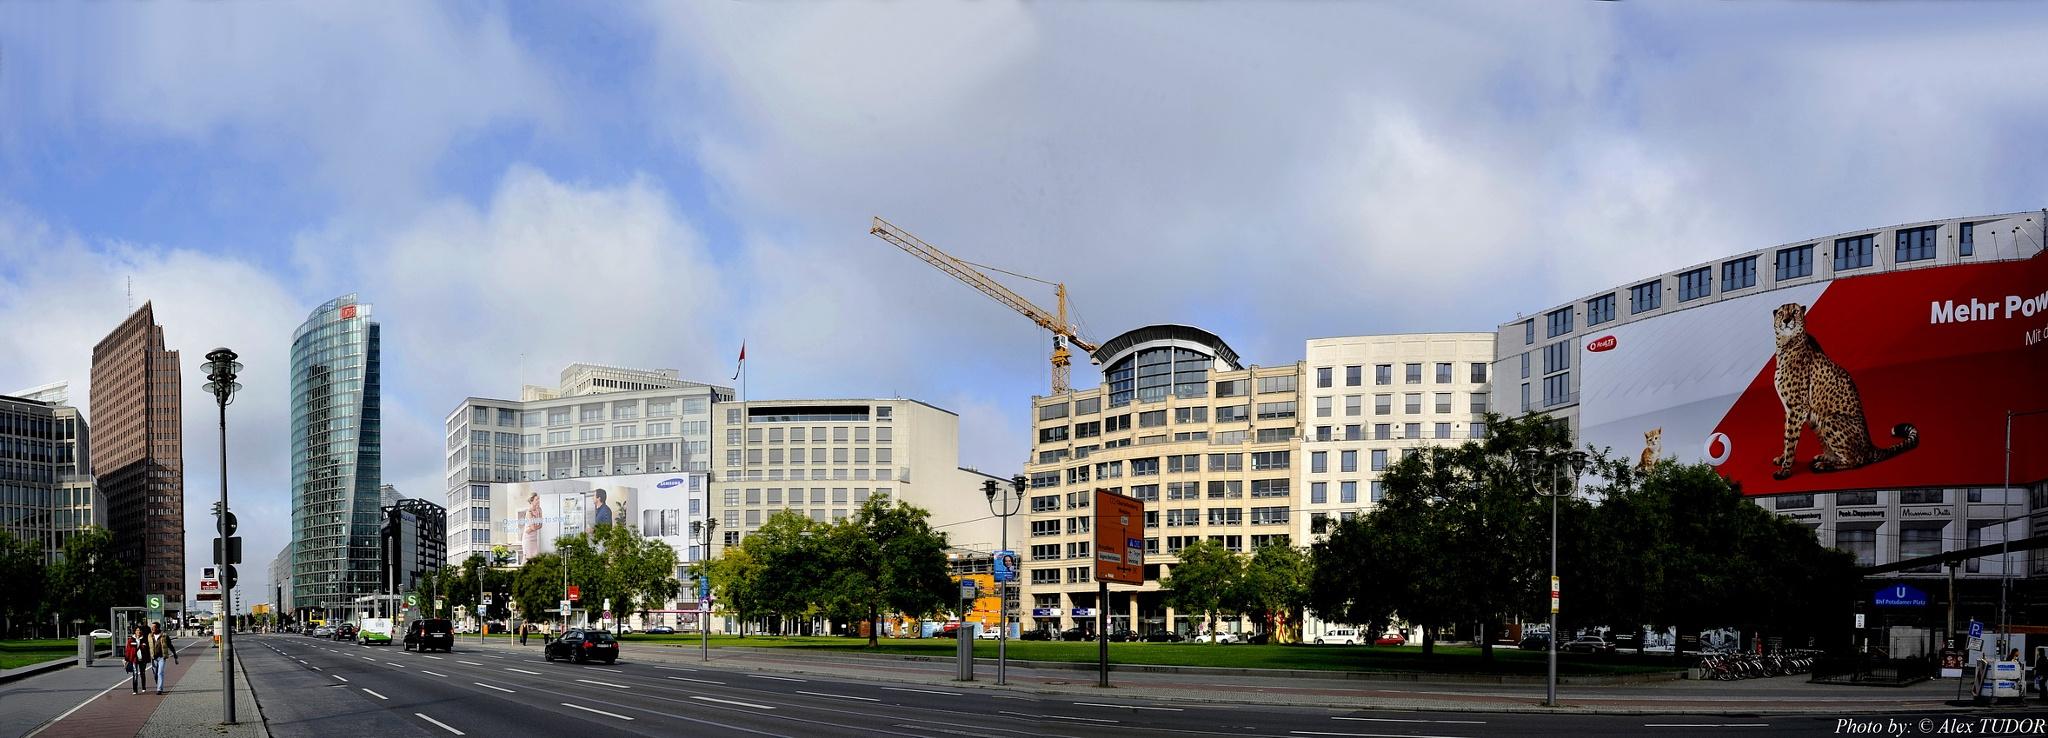 Berlin - Germany by alextudor84